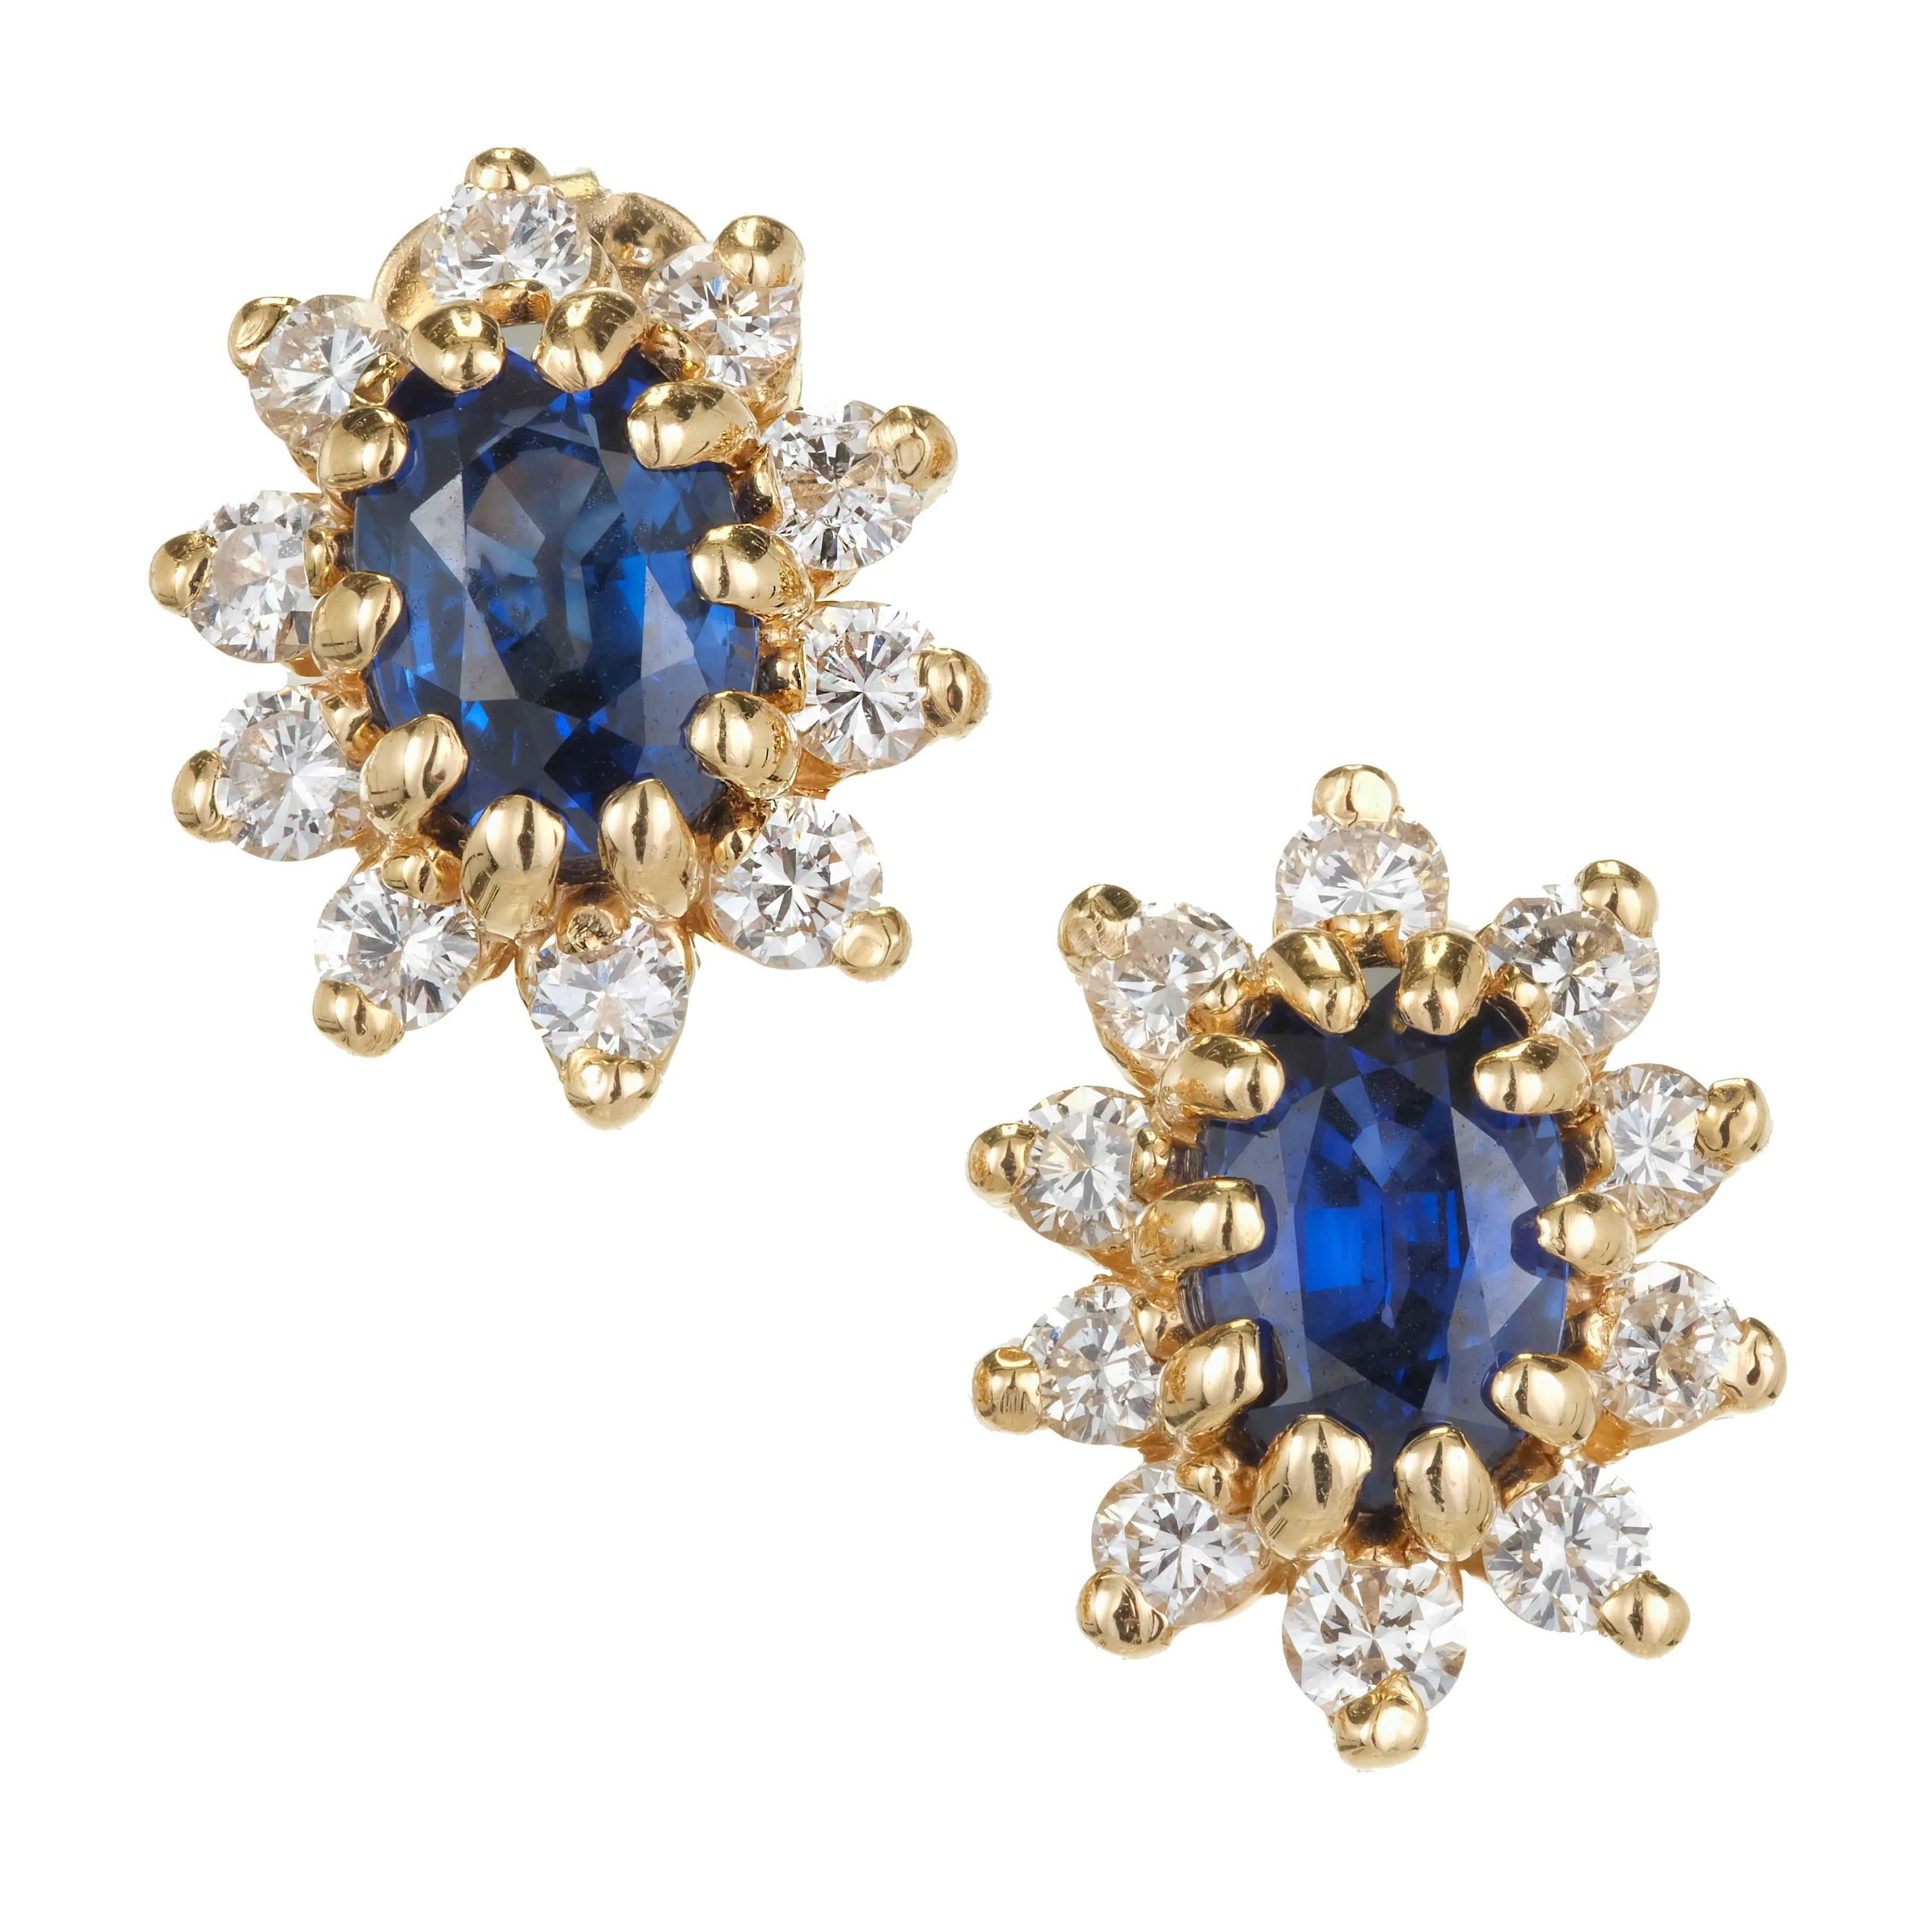 1.20 Carat Oval Sapphire Diamond Halo Gold Earrings